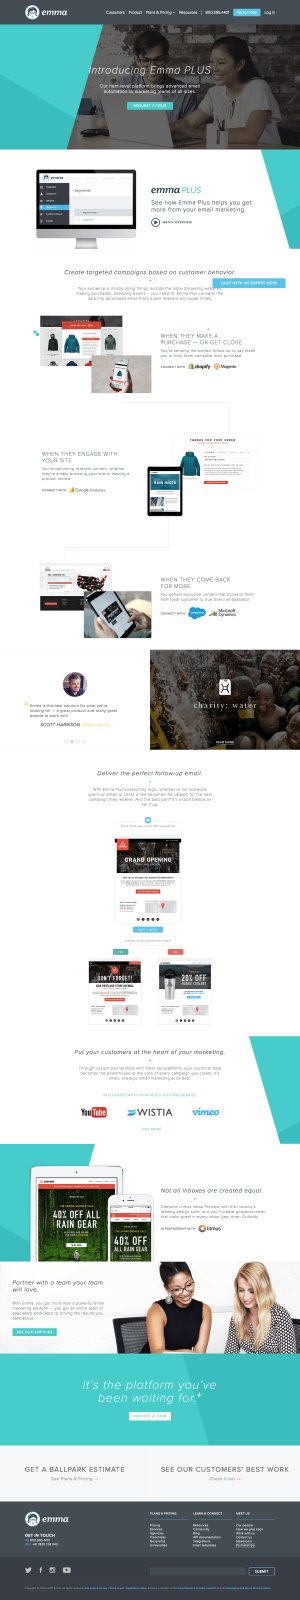 Homepage inspiration -saas Emma